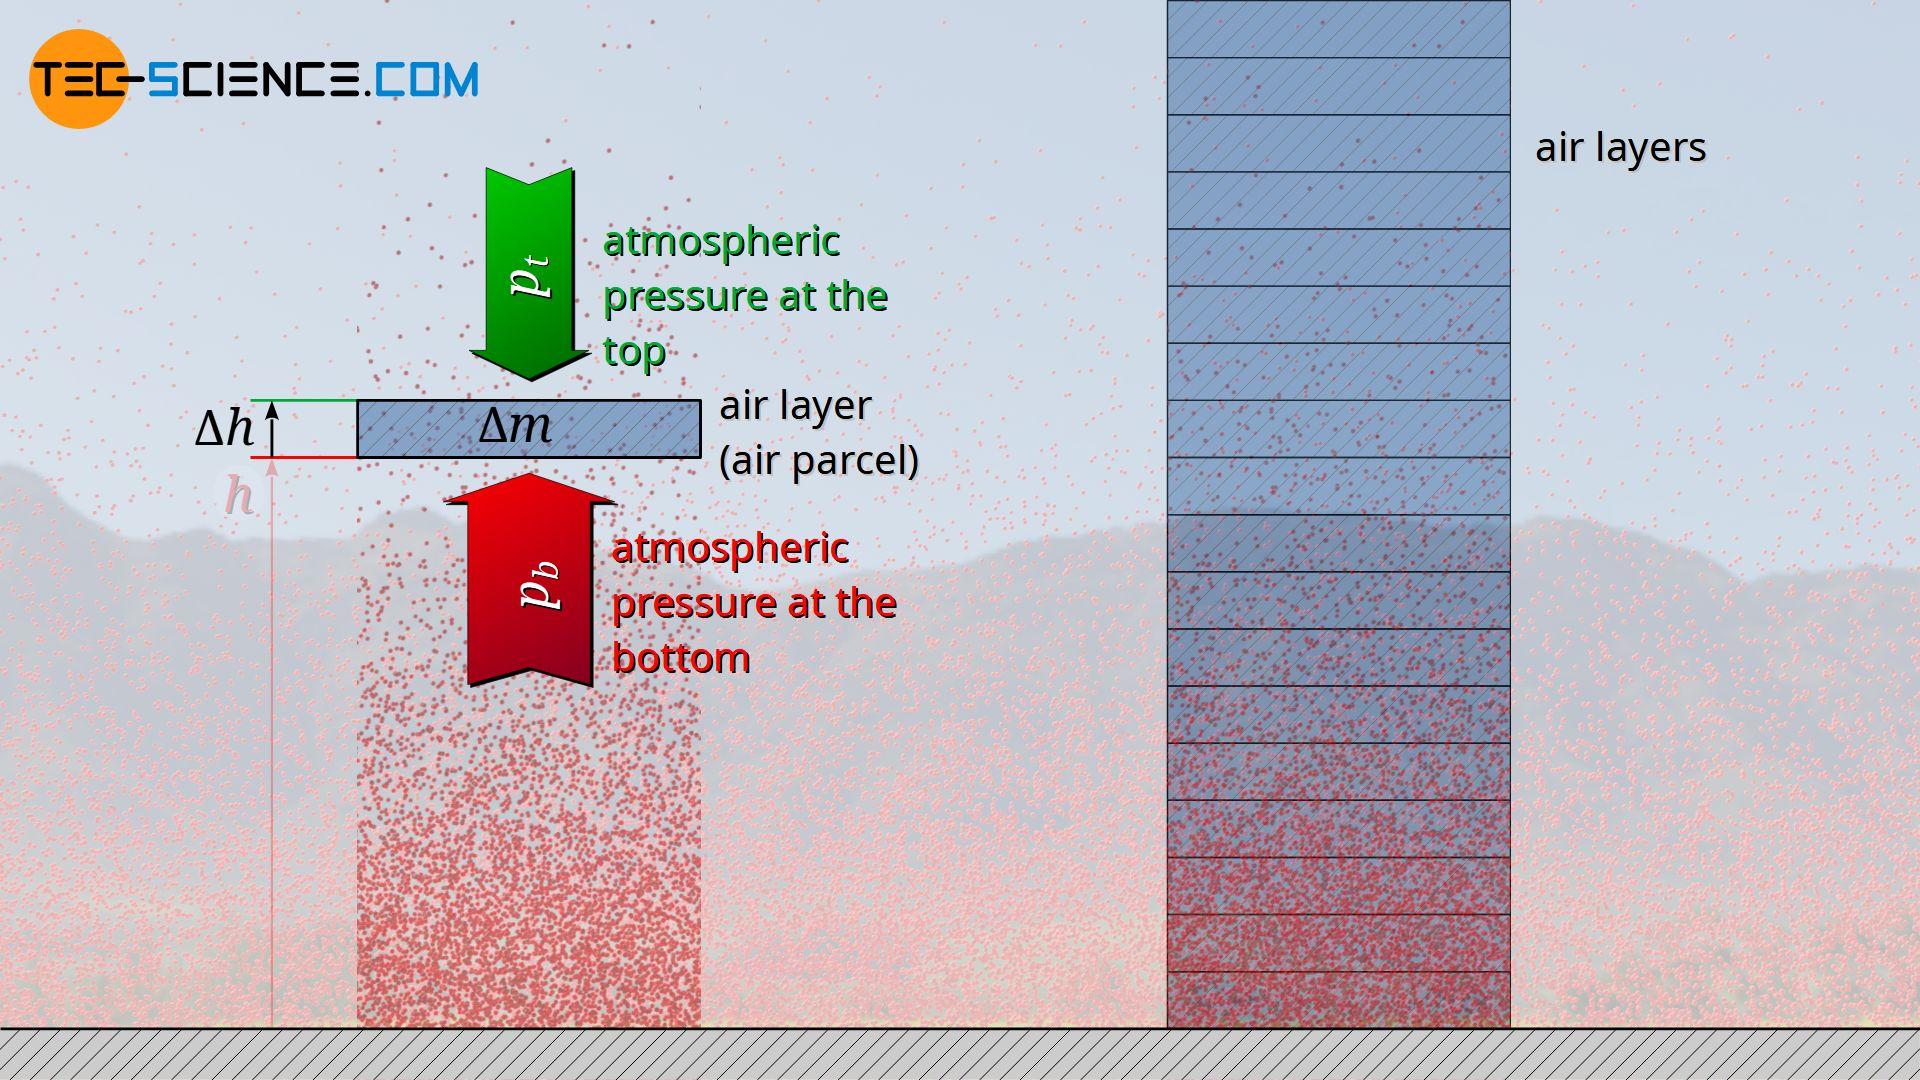 Decrease in atmospheric air pressure with increasing altitude